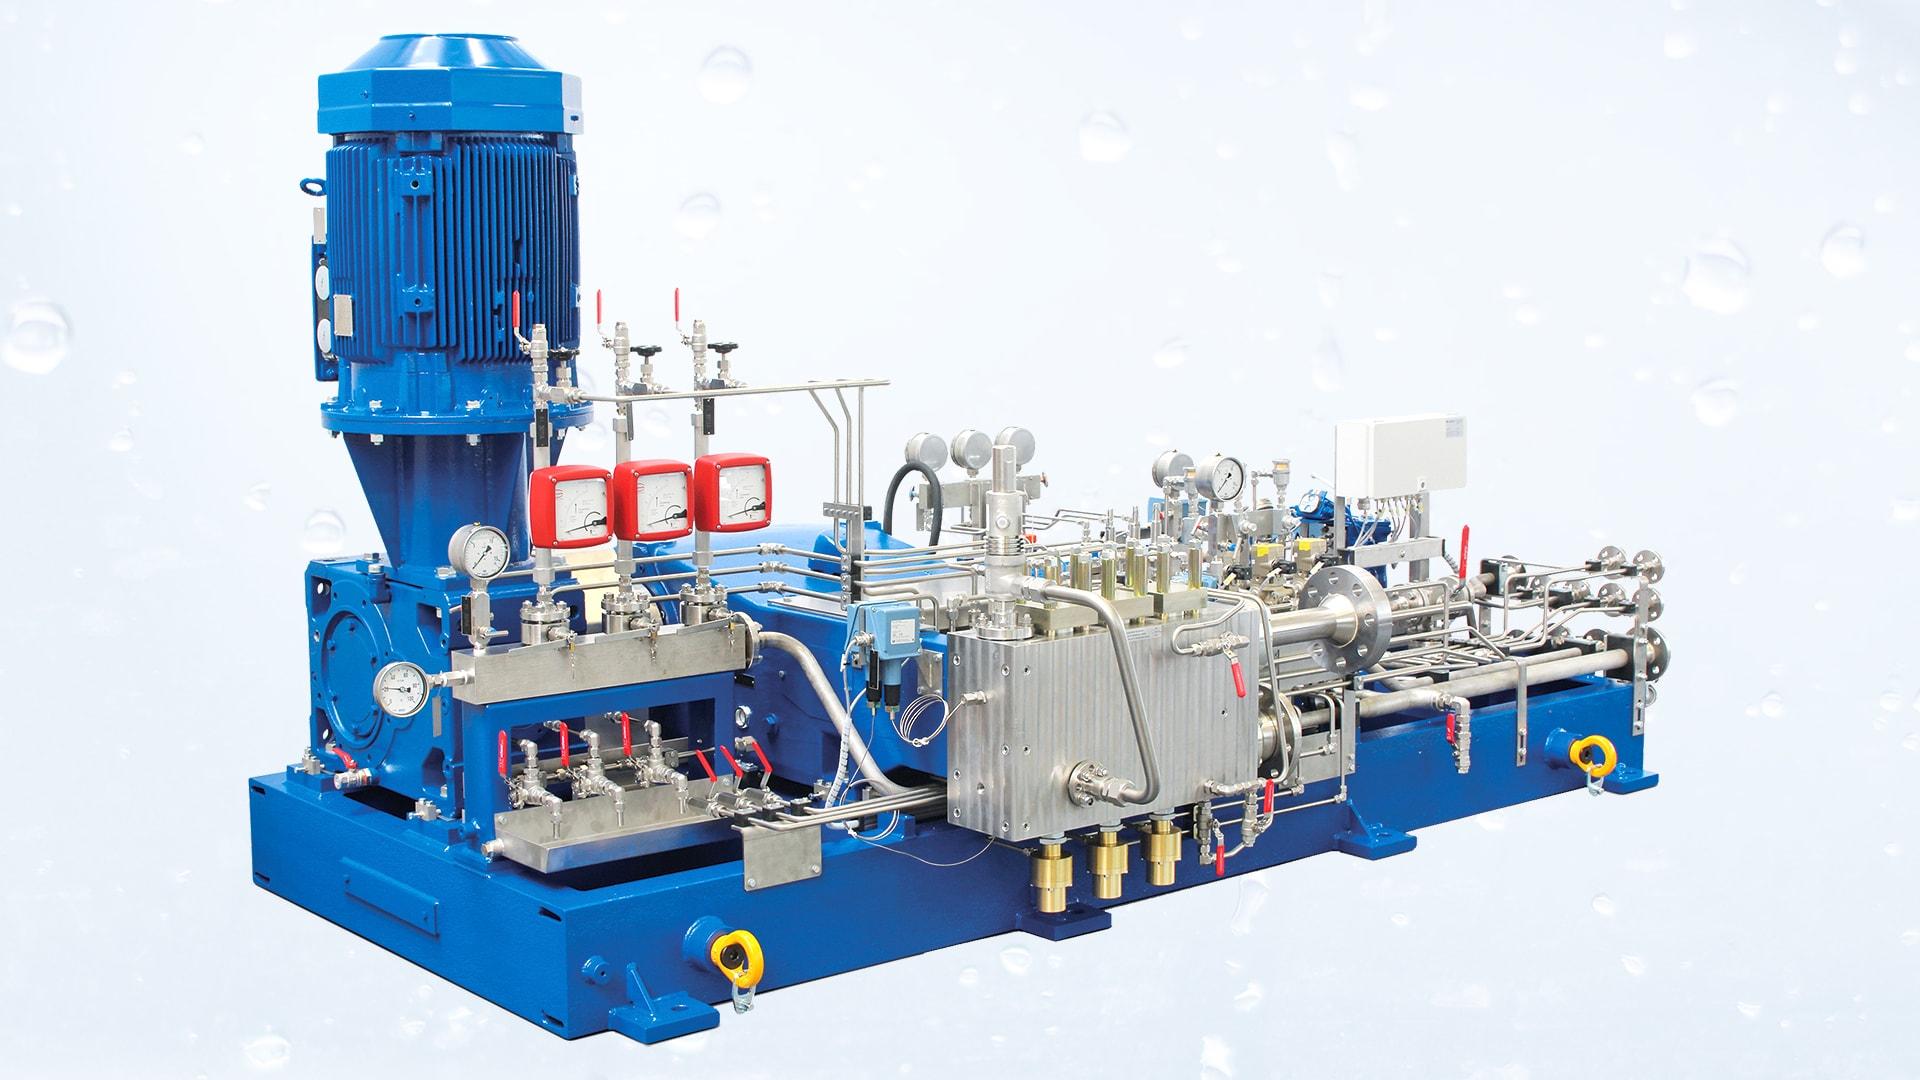 Висока надежност на процеса при производство на фосфати